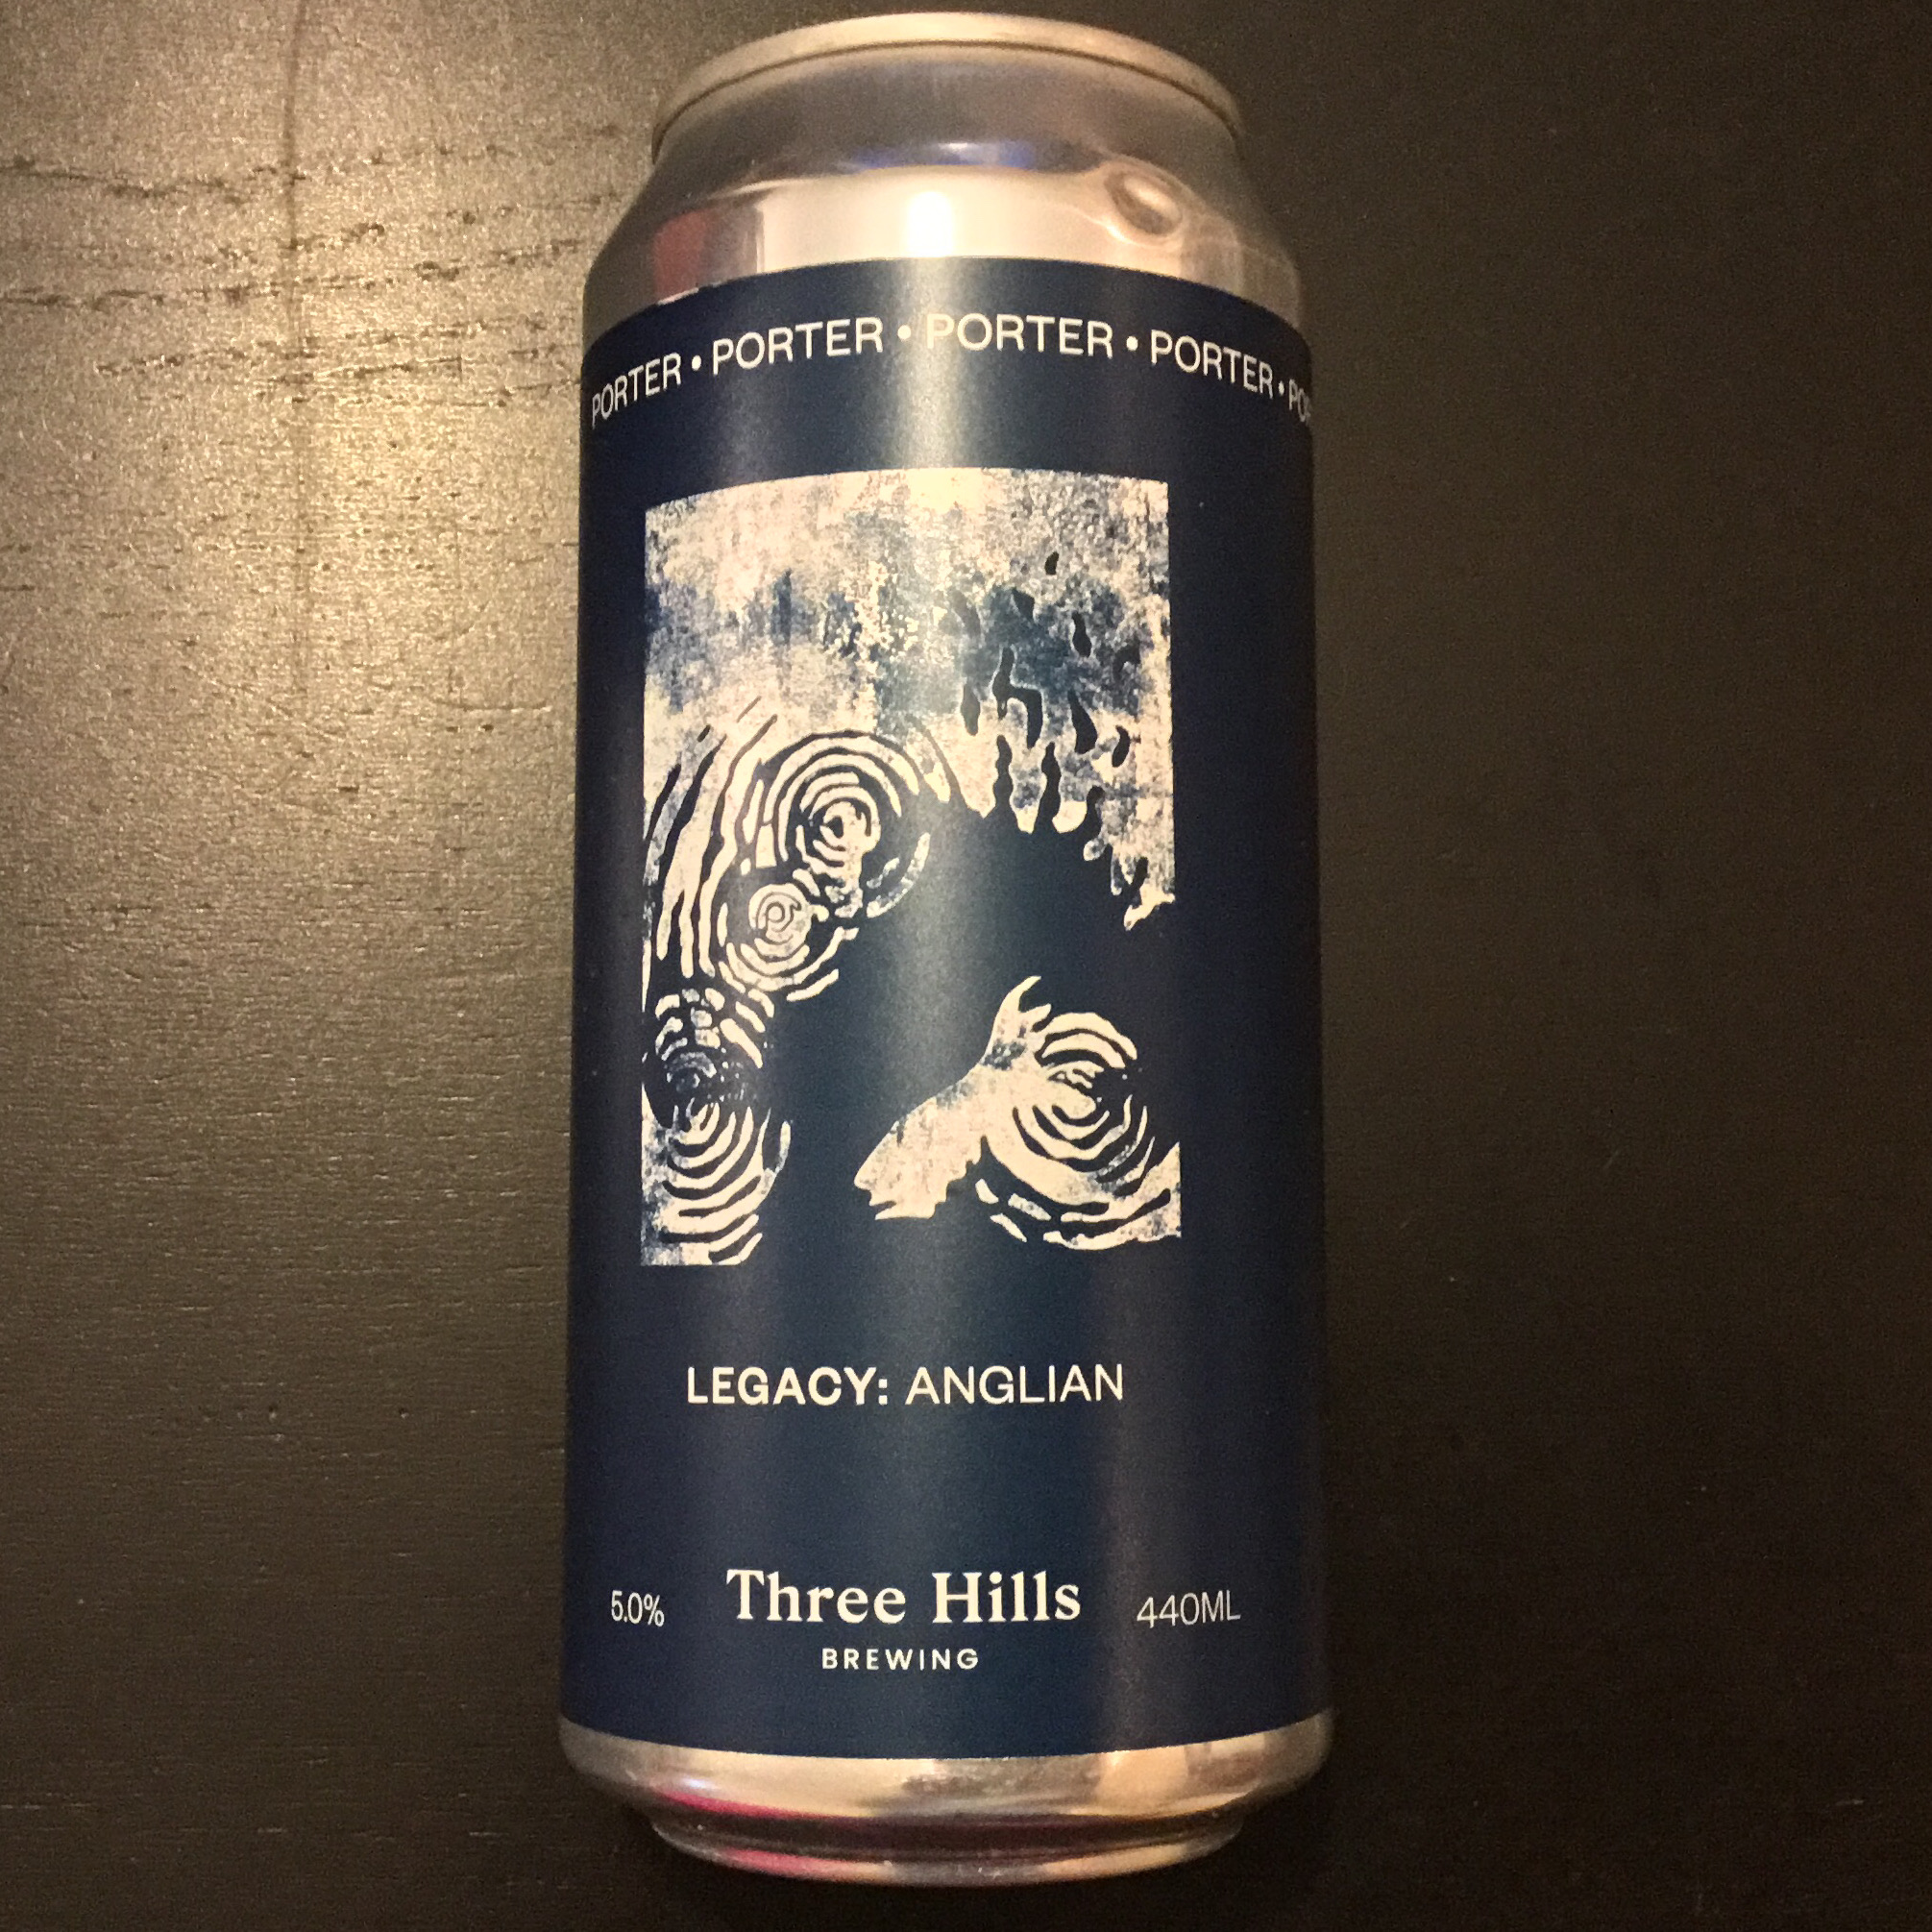 Anglian Legacy Porter 5% 440ml Three Hills Brewing